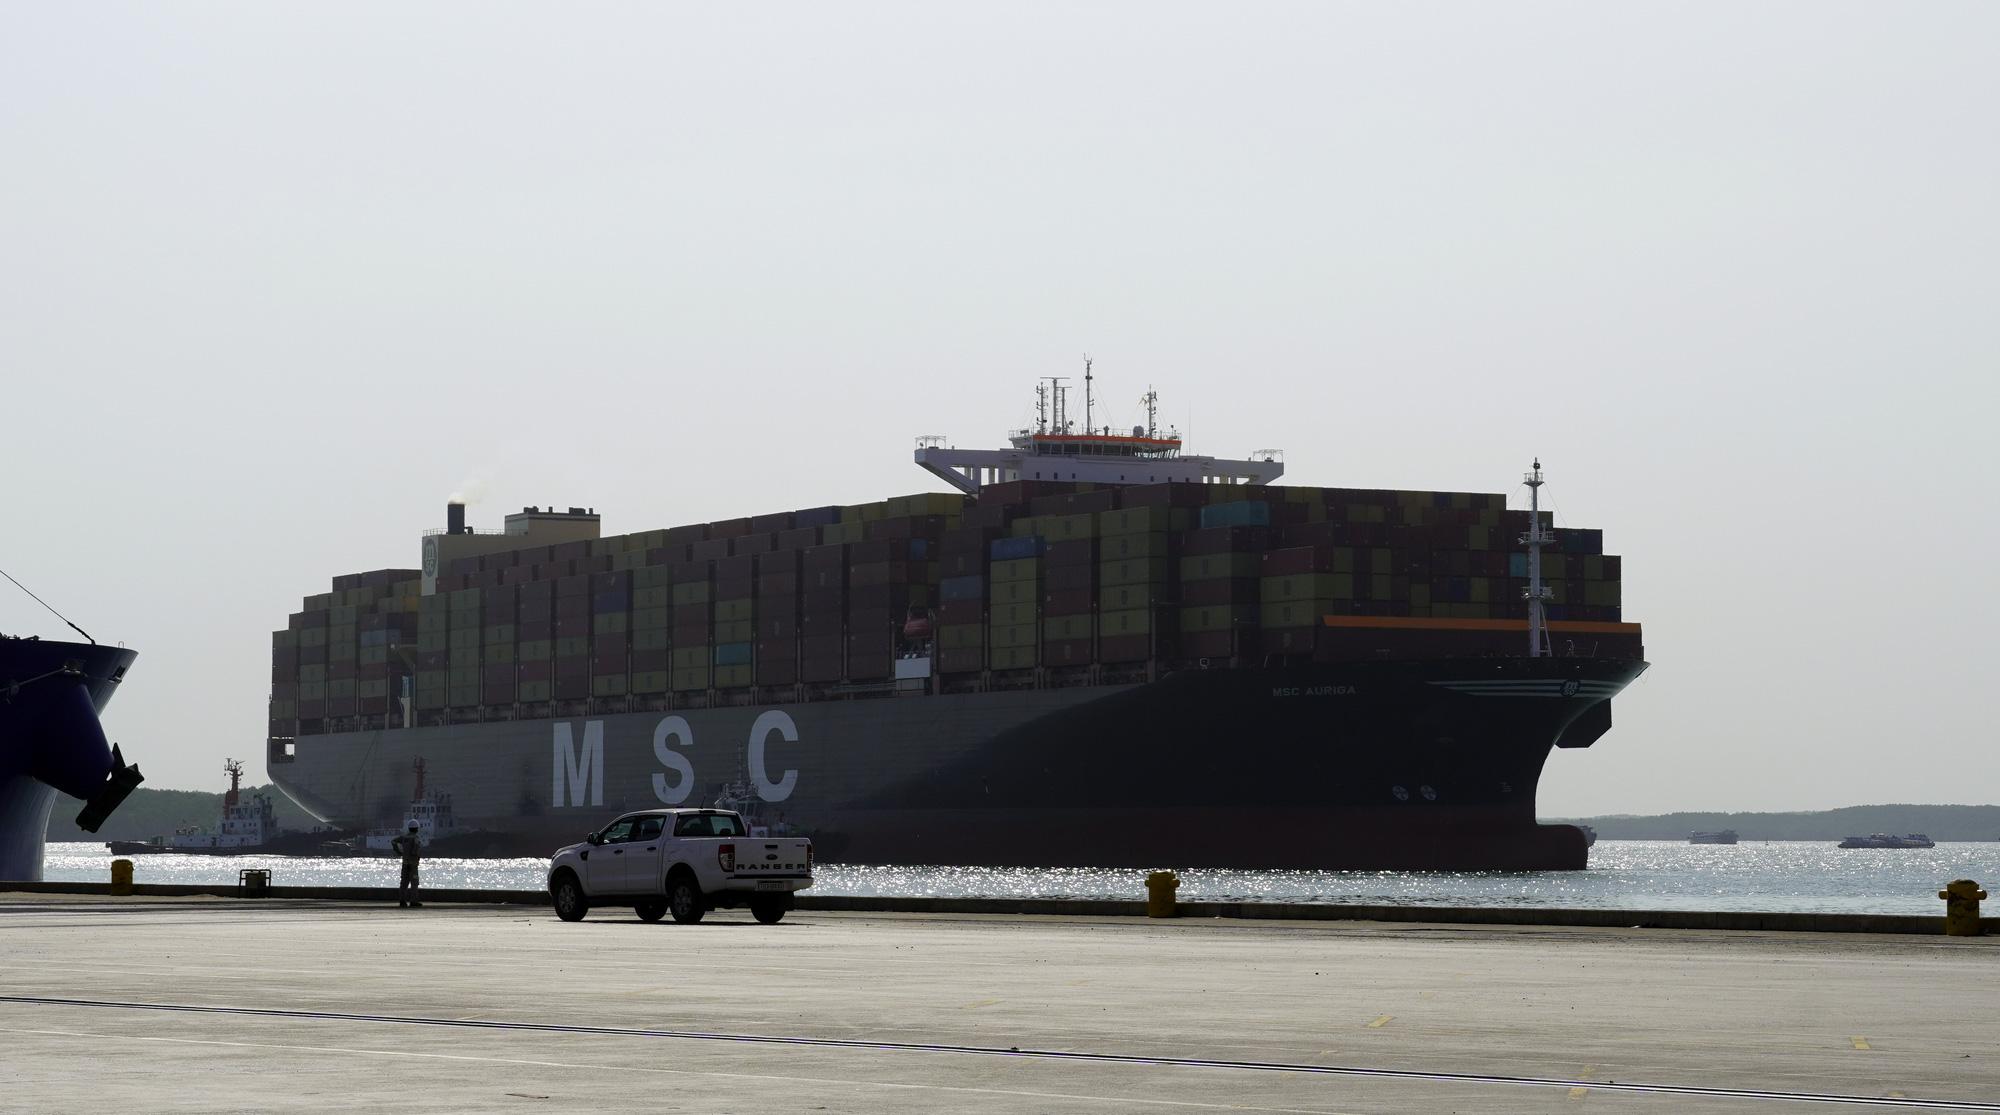 Portugal-flagged cargo vessel MSC Auriga arrives at SP-SSA International Terminal (SSIT) in Ba Ria - Vung Tau Province, Vietnam, March 22, 2021. Photo: Dong Ha / Tuoi Tre